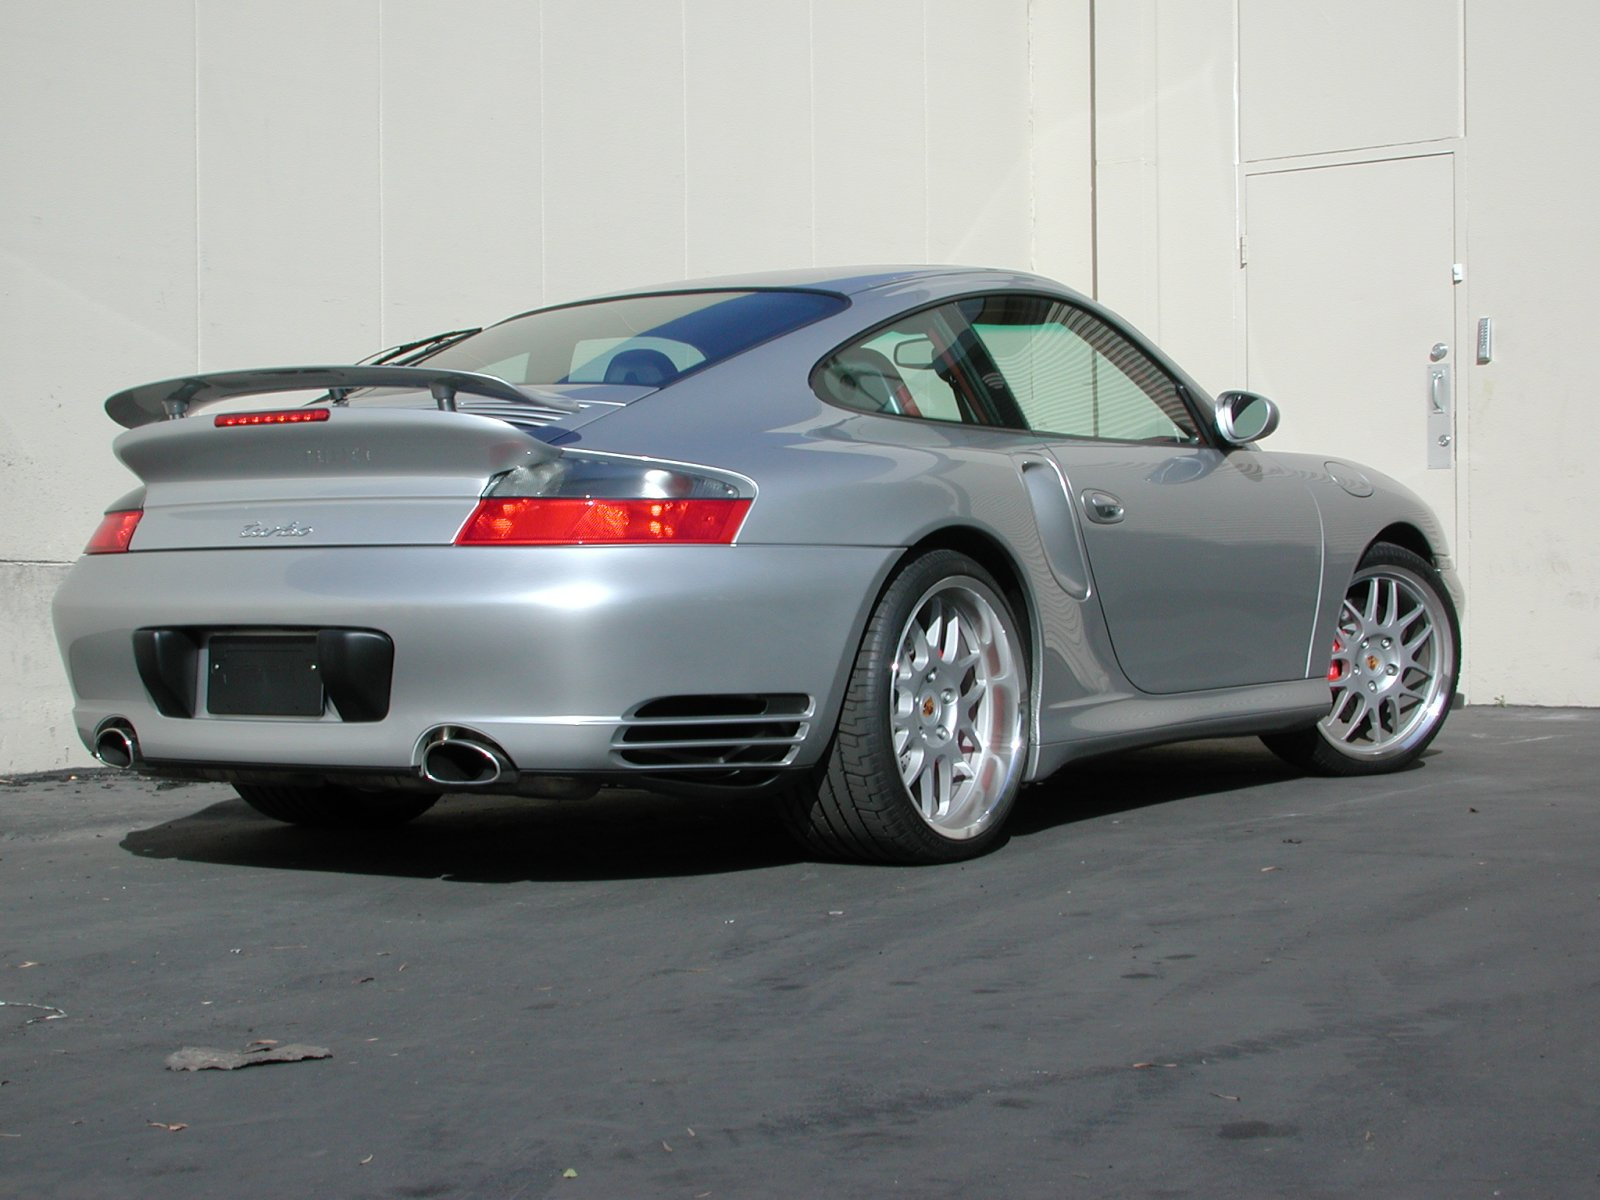 Porsche 911 Turbo 996 Picture 15307 Porsche Photo Gallery